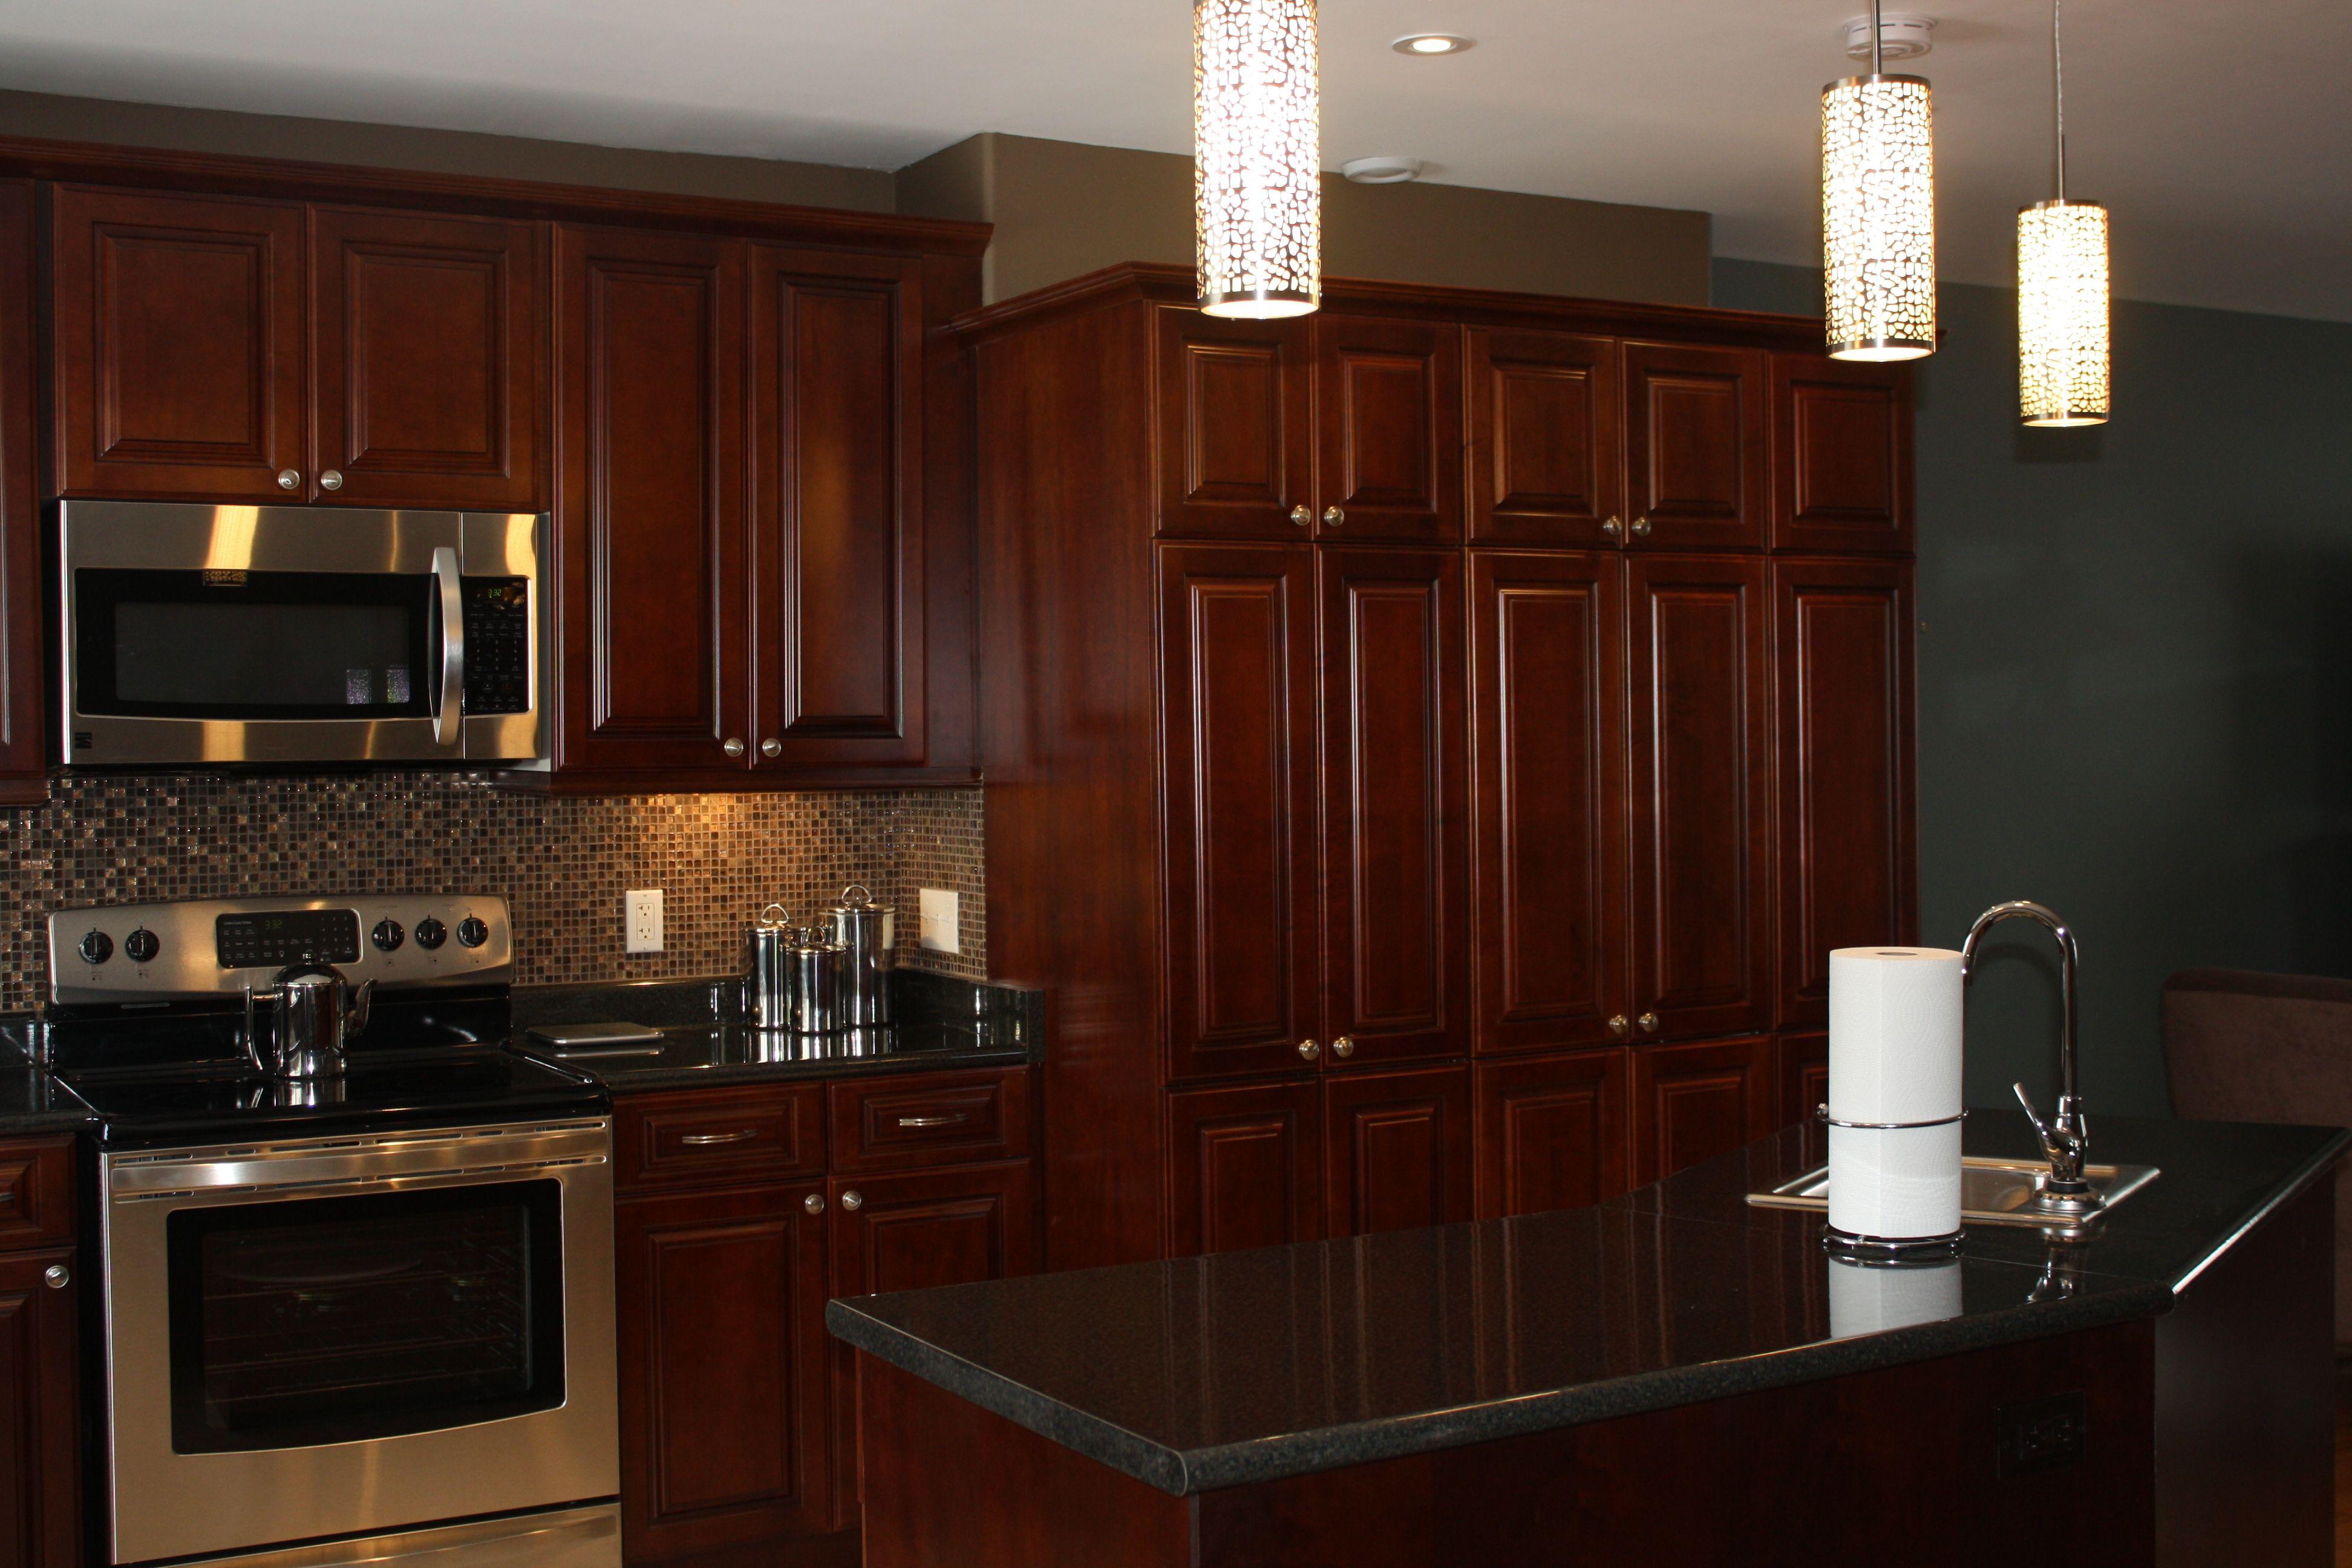 Halifax NS, Kitchen Remodel, Maple Cabinets, Granite Counter Tops, Tile Back Splash, Modern Appliances